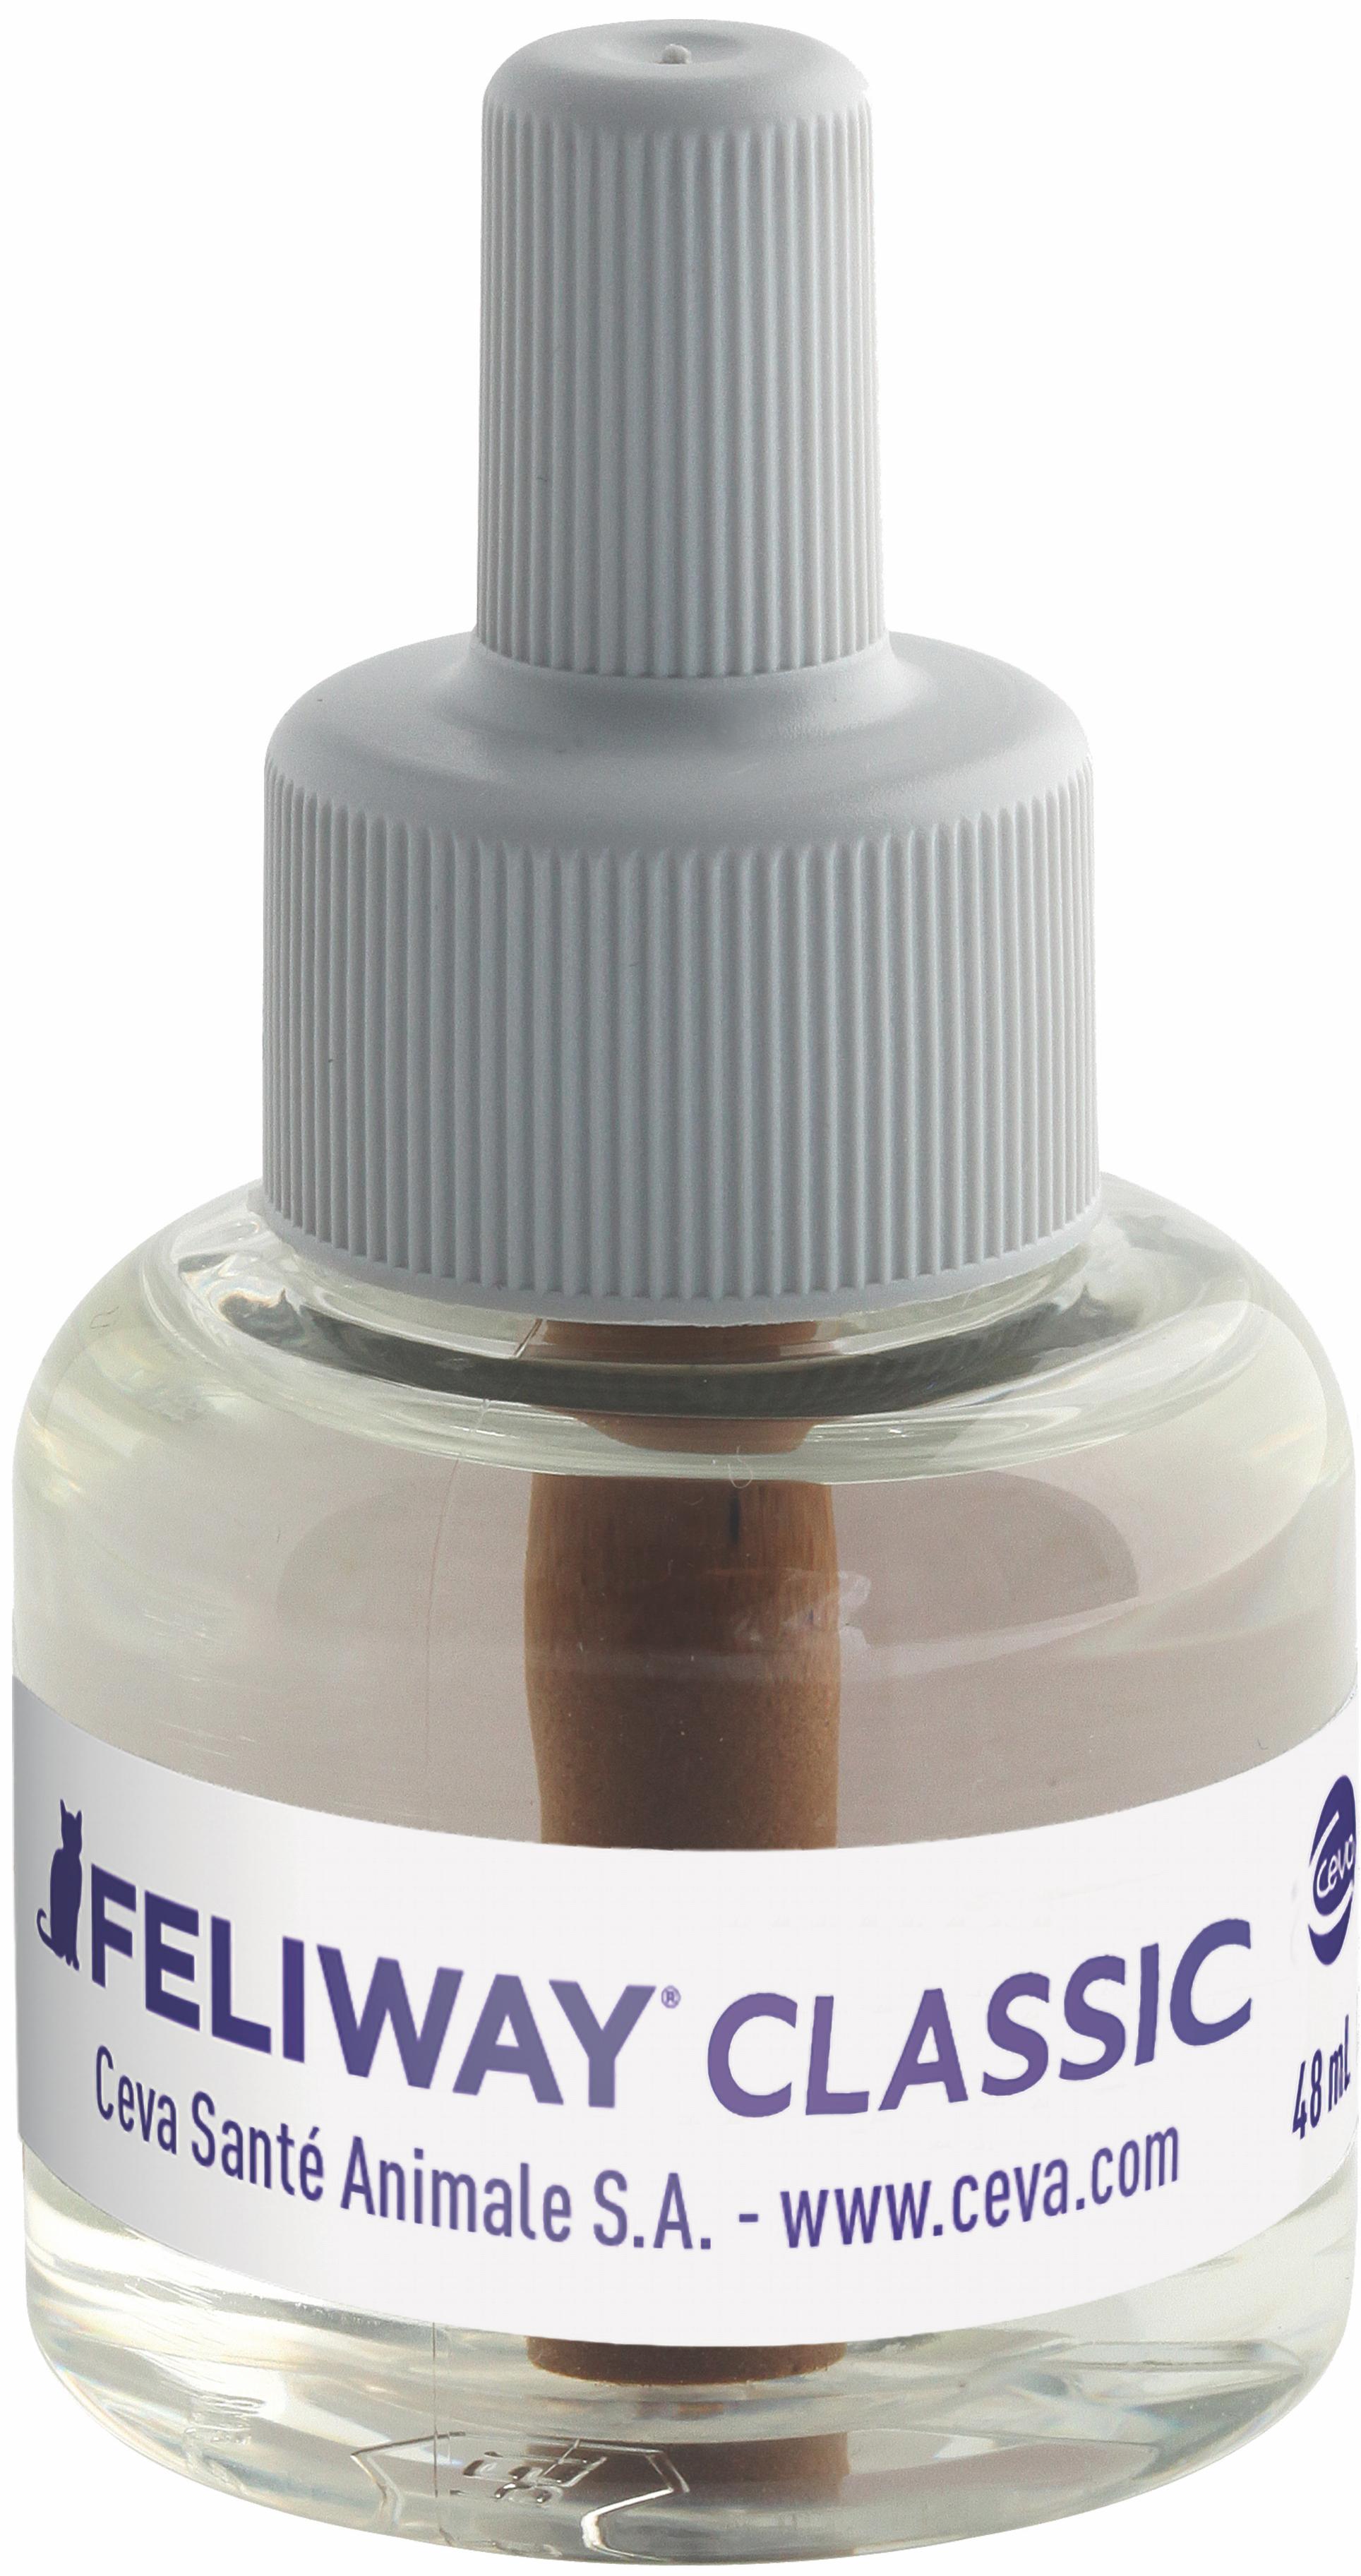 Feliway Classic Refill - 48 ml